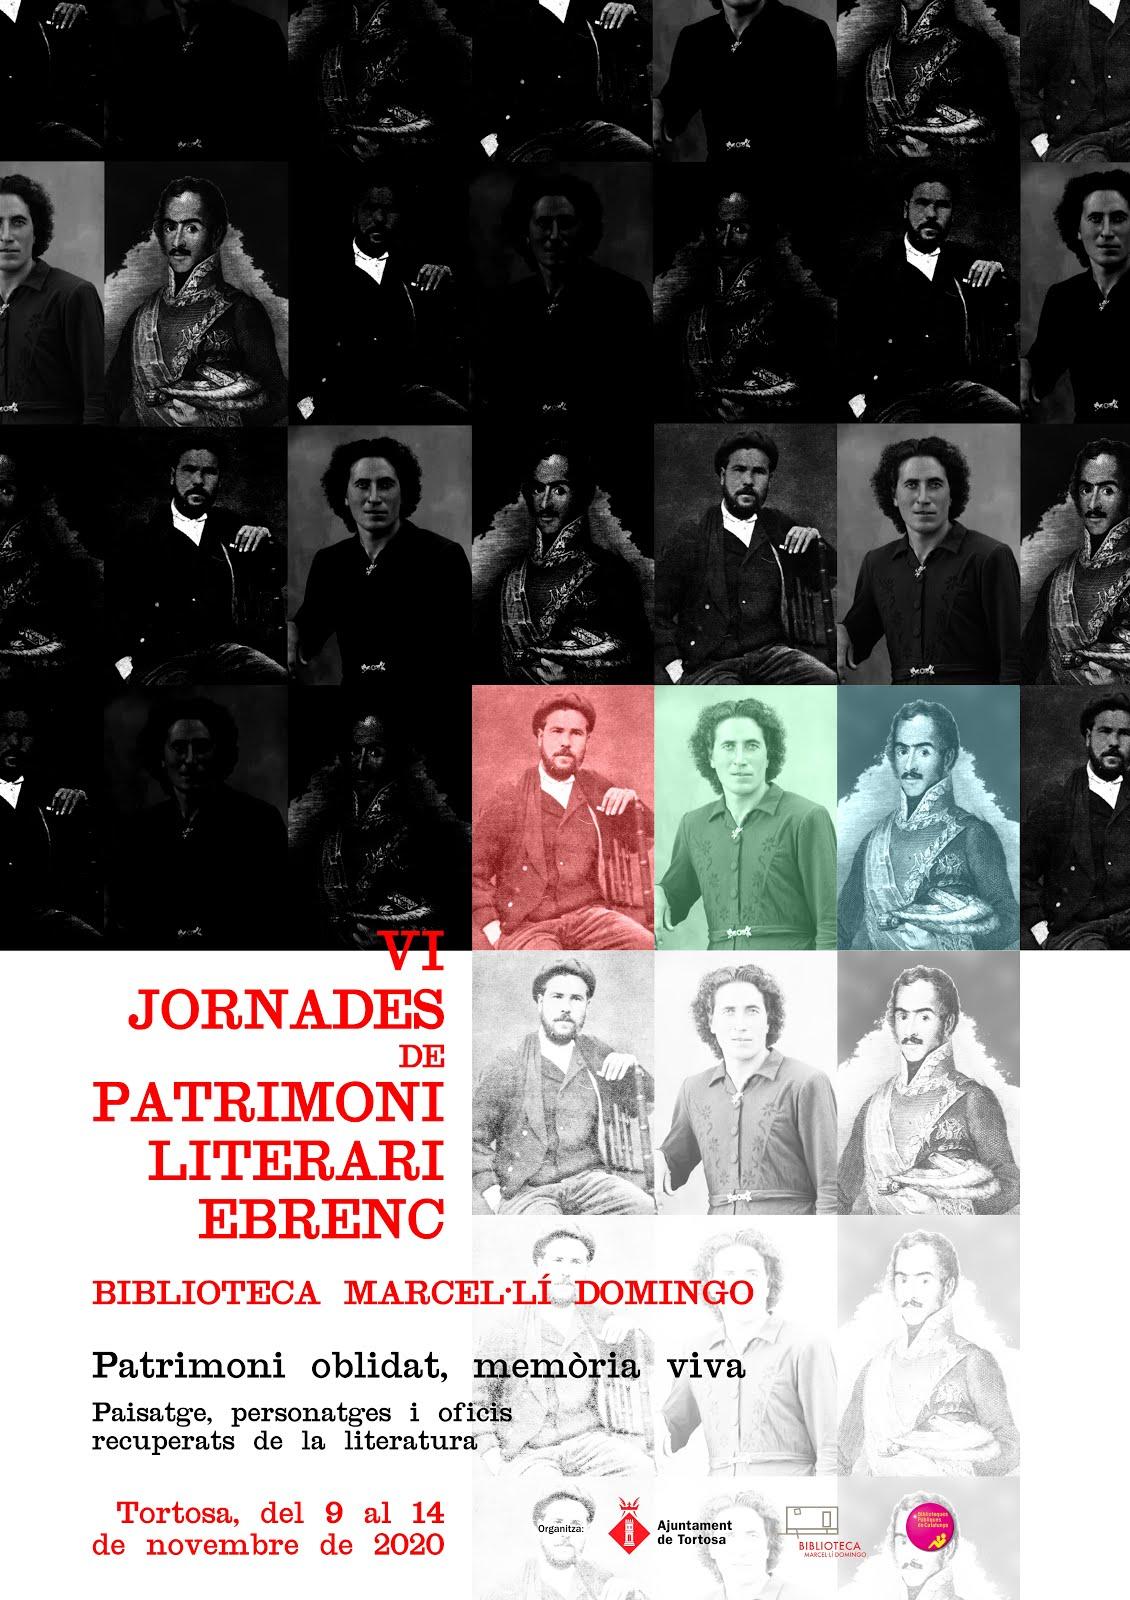 "VI Jornades de Patrimoni Literari Ebrenc ""Patrimoni oblidat, memòria viva."